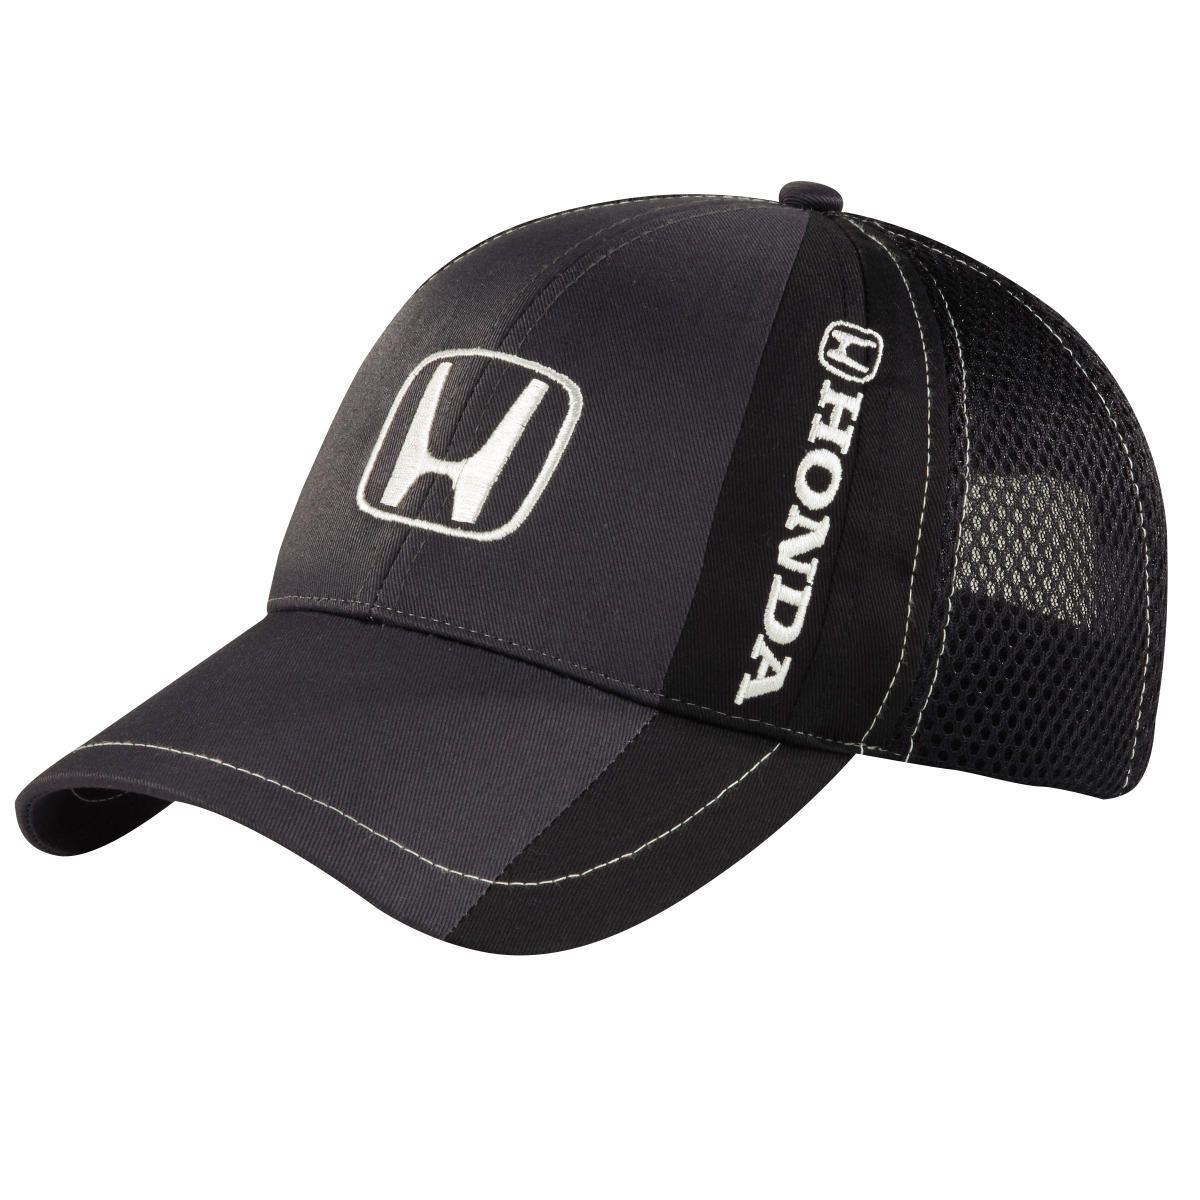 Honda Mesh Side Logo Cap College Hills Honda Hats for